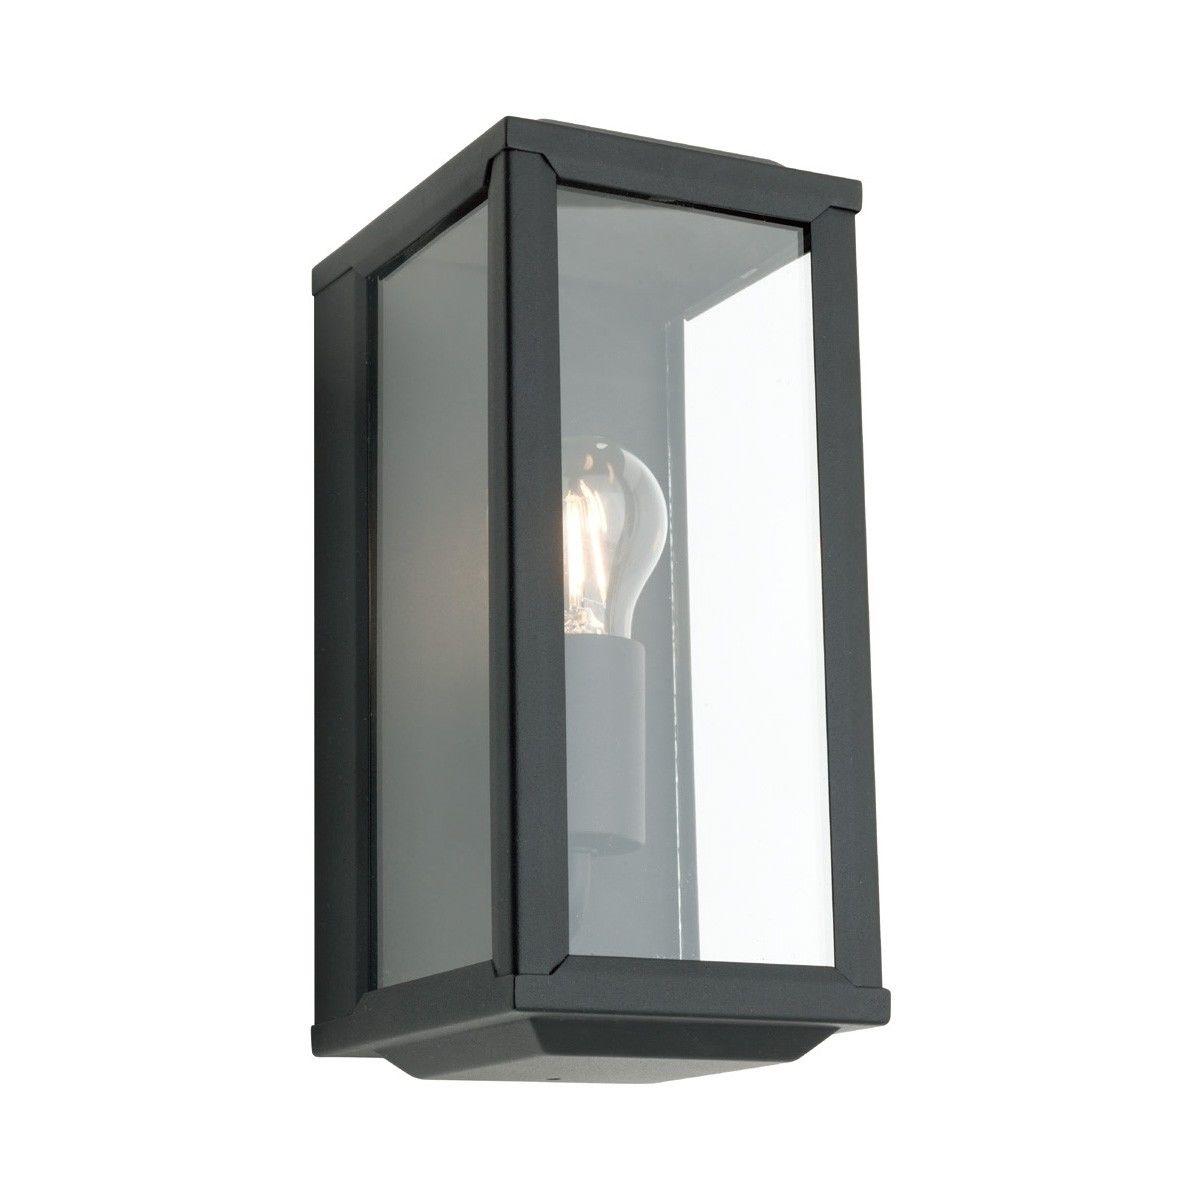 Anglesea Metal and Glass IP44 Outdoor Wall Light - Black